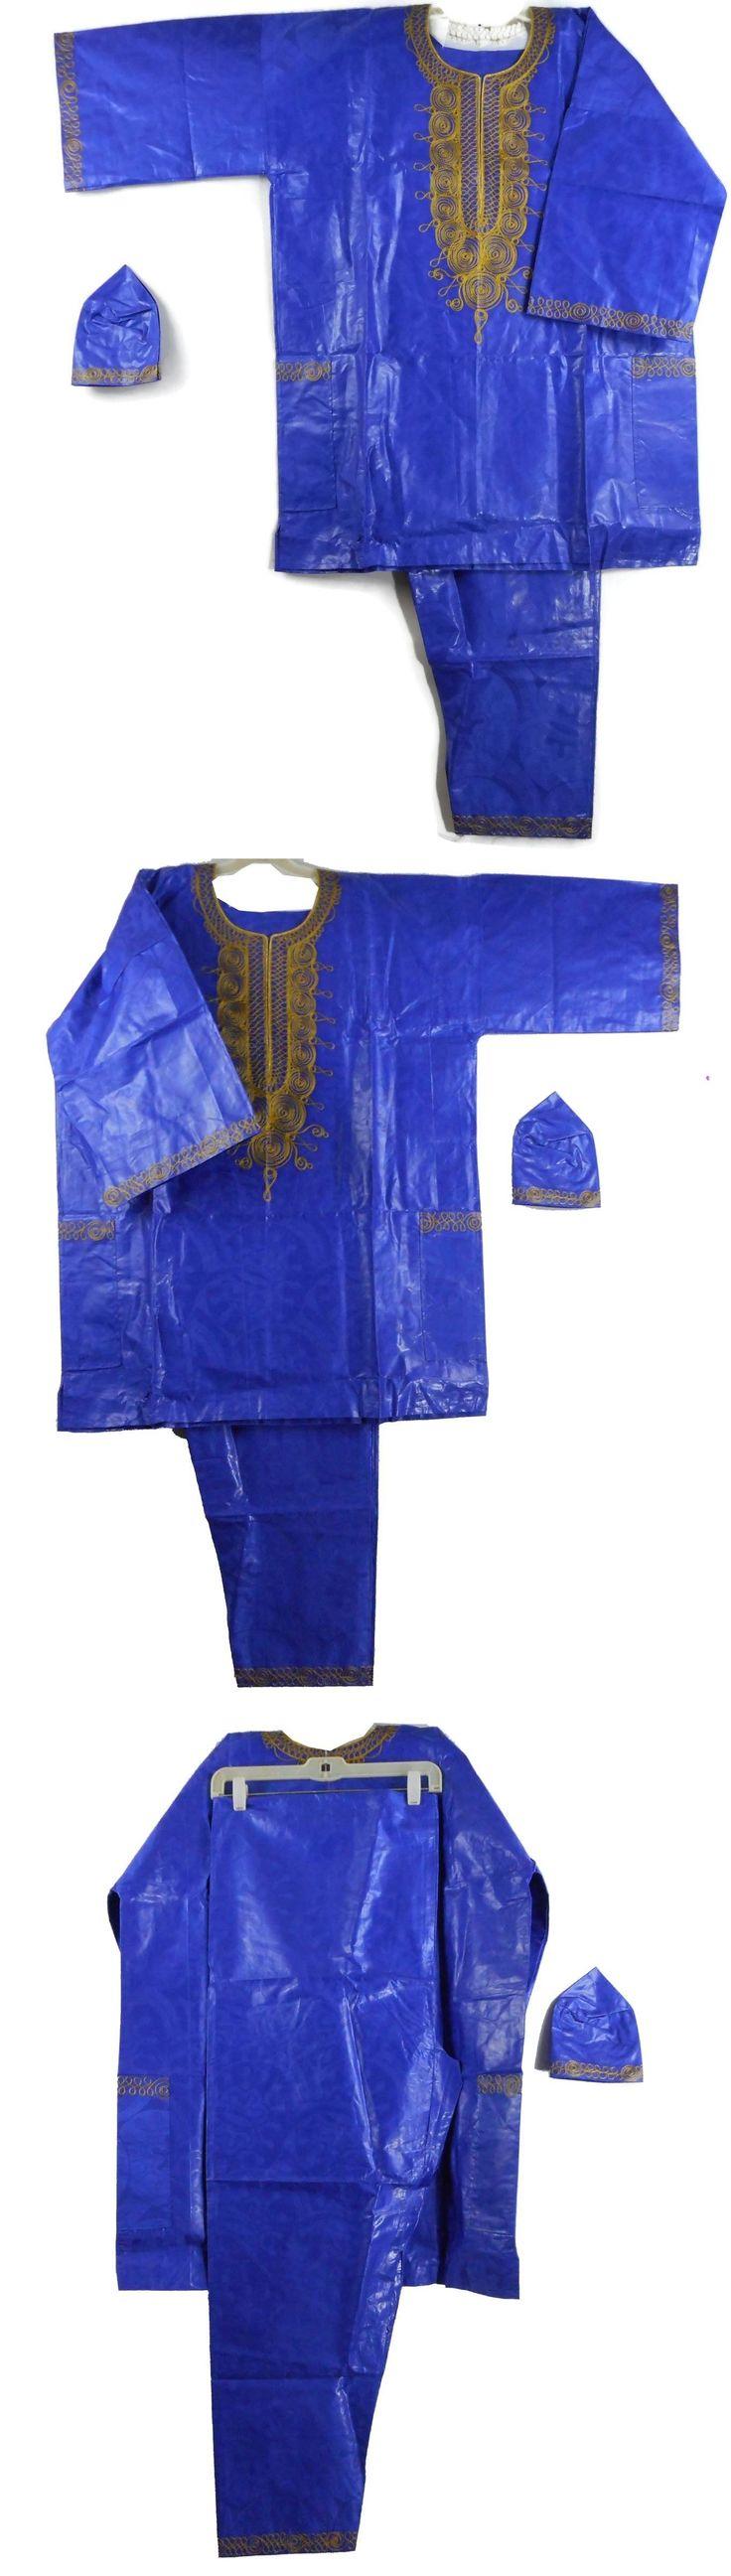 Africa 155241: Traditional Brocade Pant Set African Men Dashiki Boho Suit Plus Siz D Blue Gold -> BUY IT NOW ONLY: $57.95 on eBay!